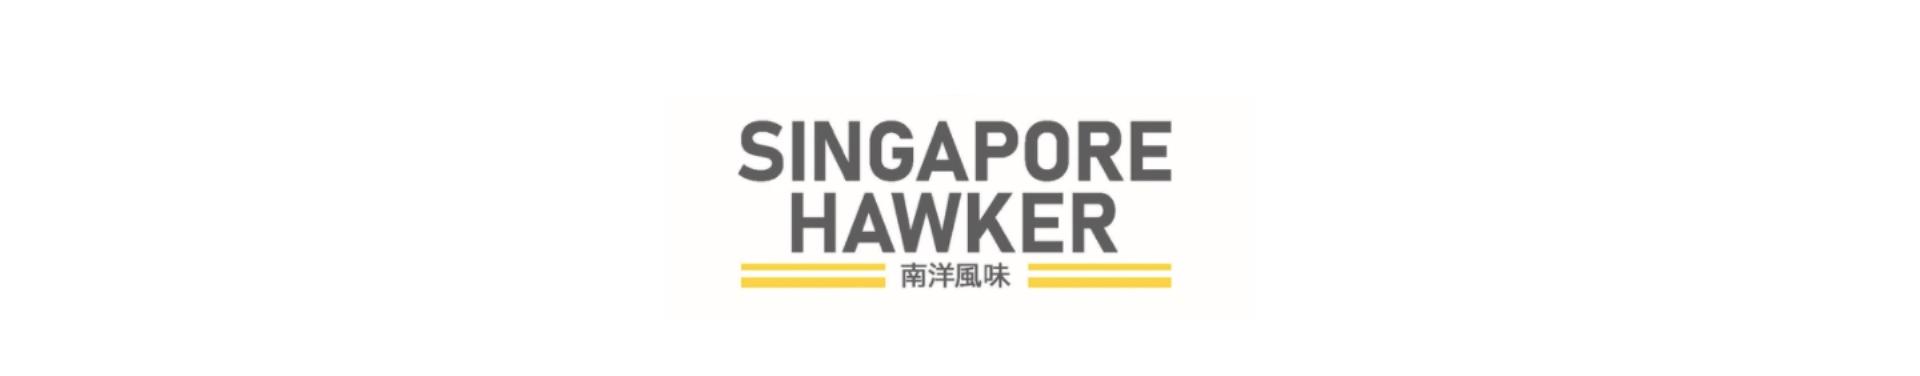 Singapore Hawker Restaurant - Picture